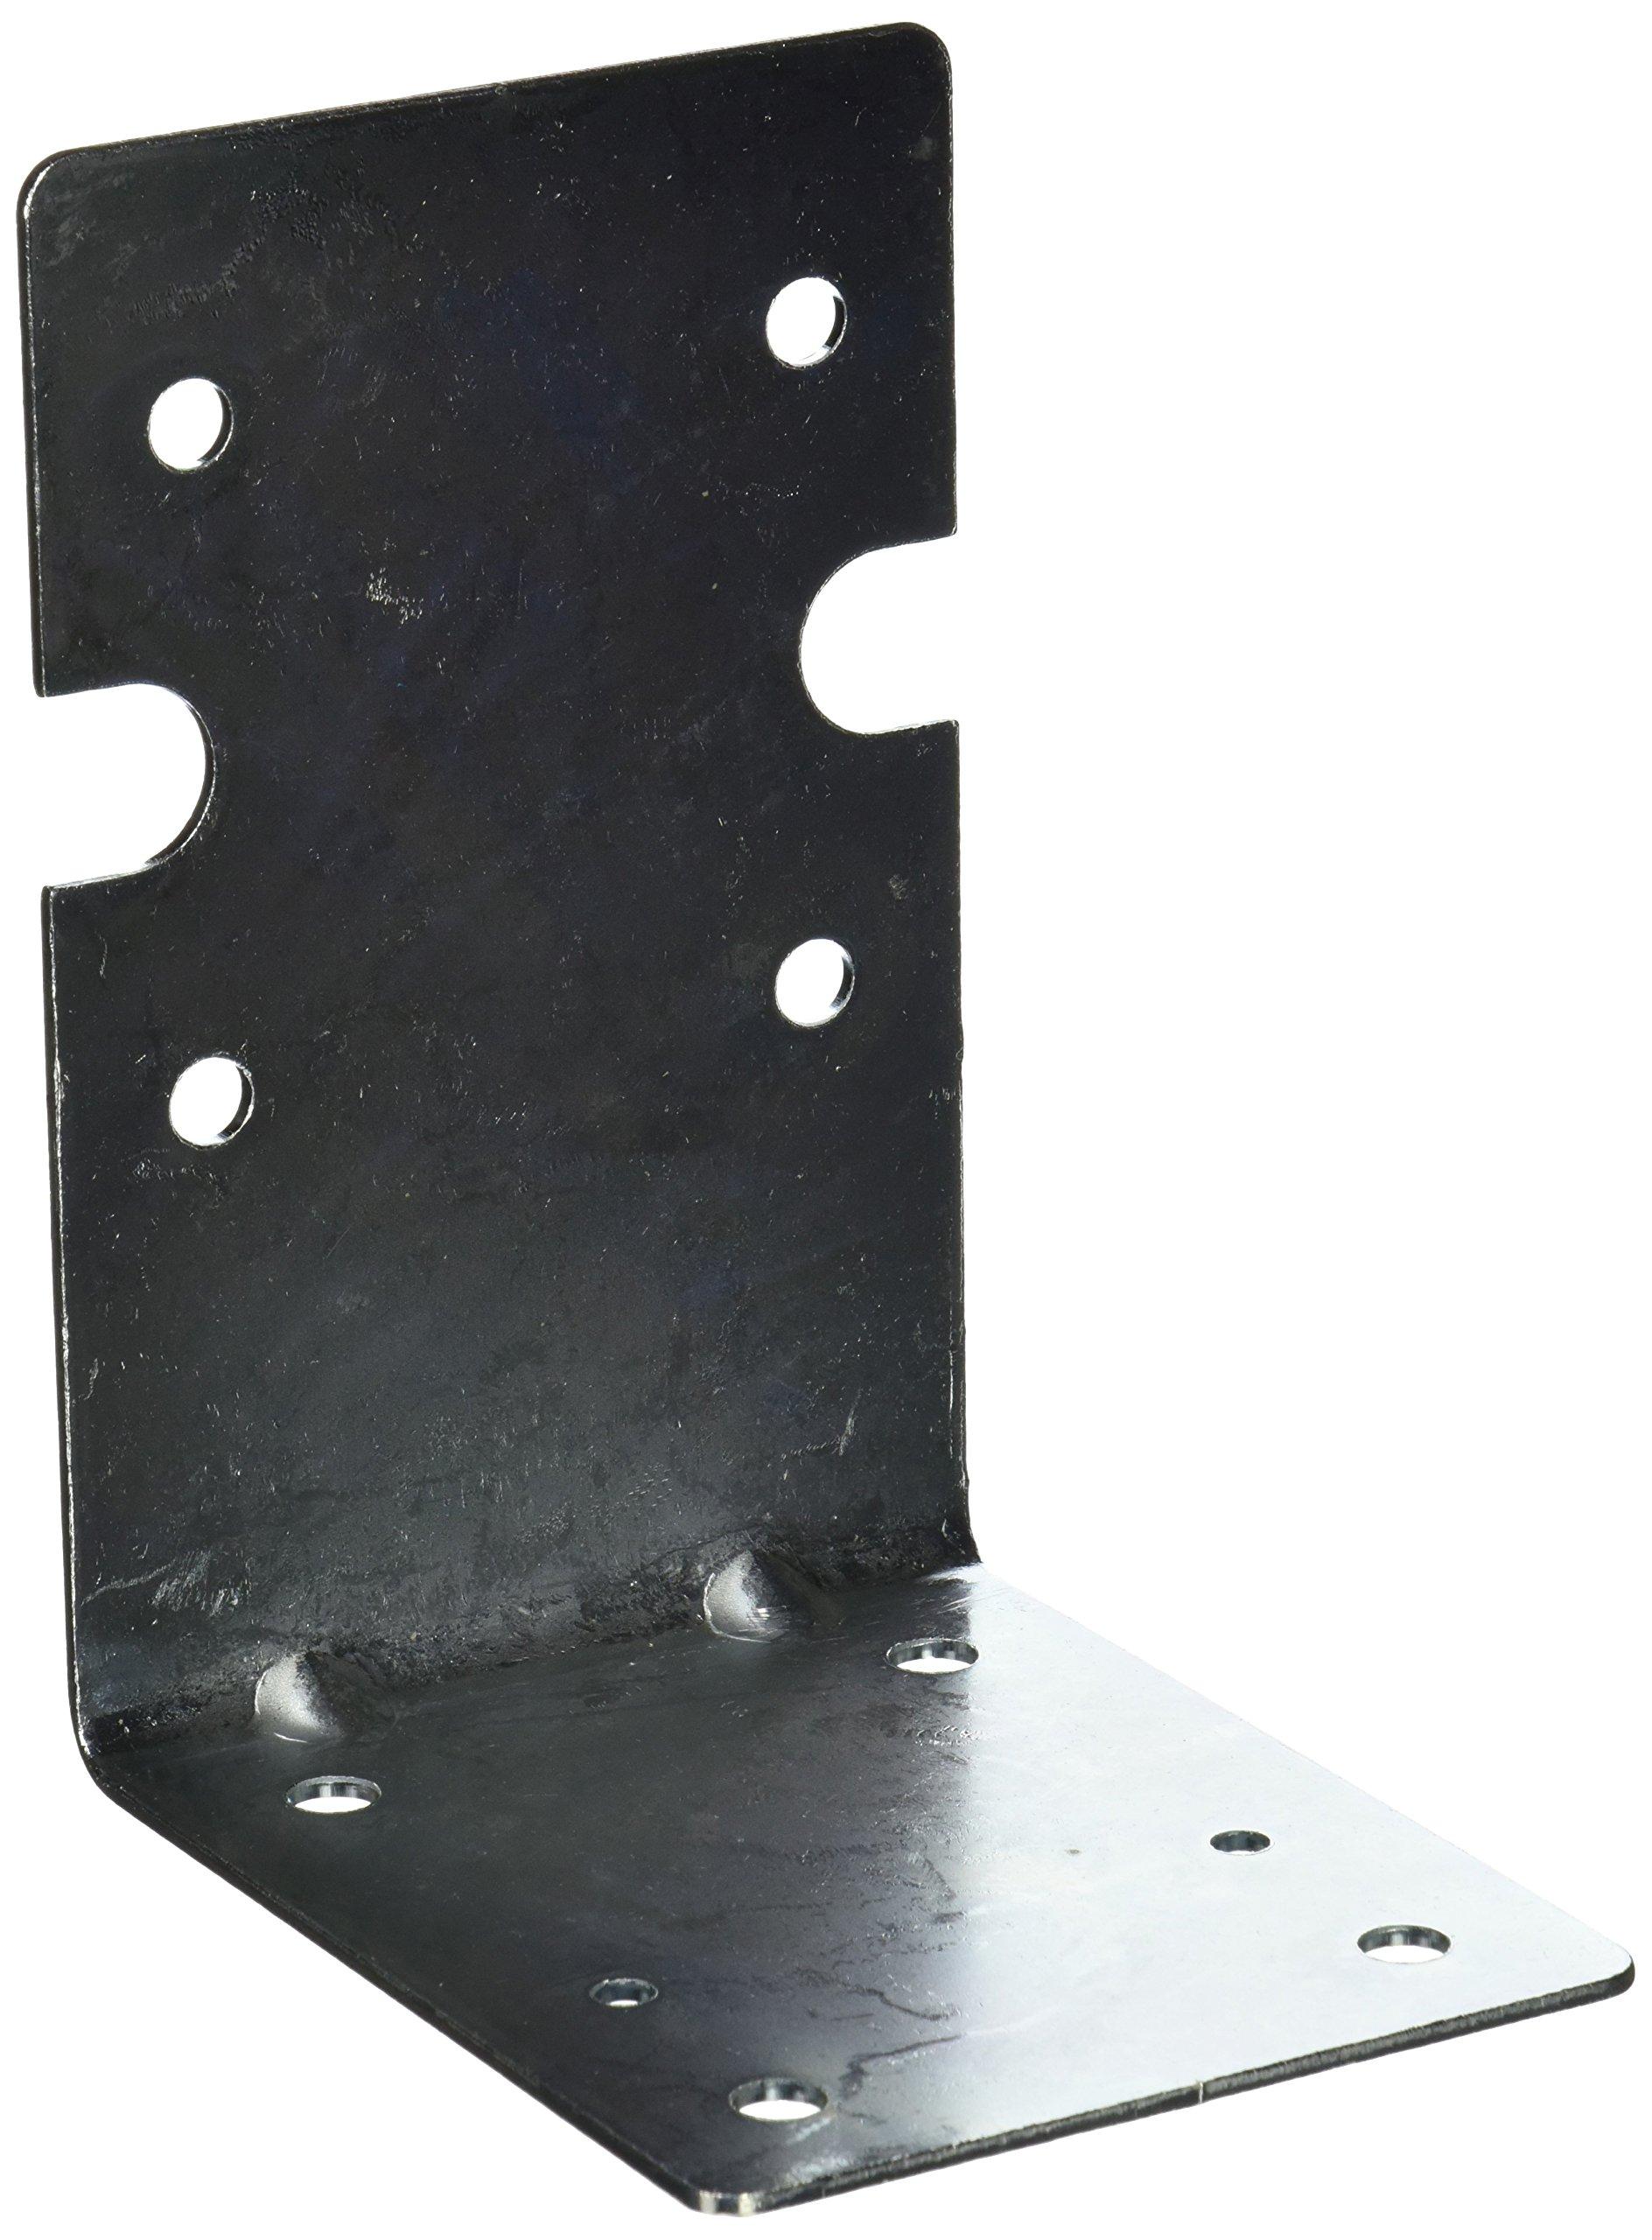 WB-SS Mounting Bracket Kit for Big Blue or Heavy Duty Housings by Pentek